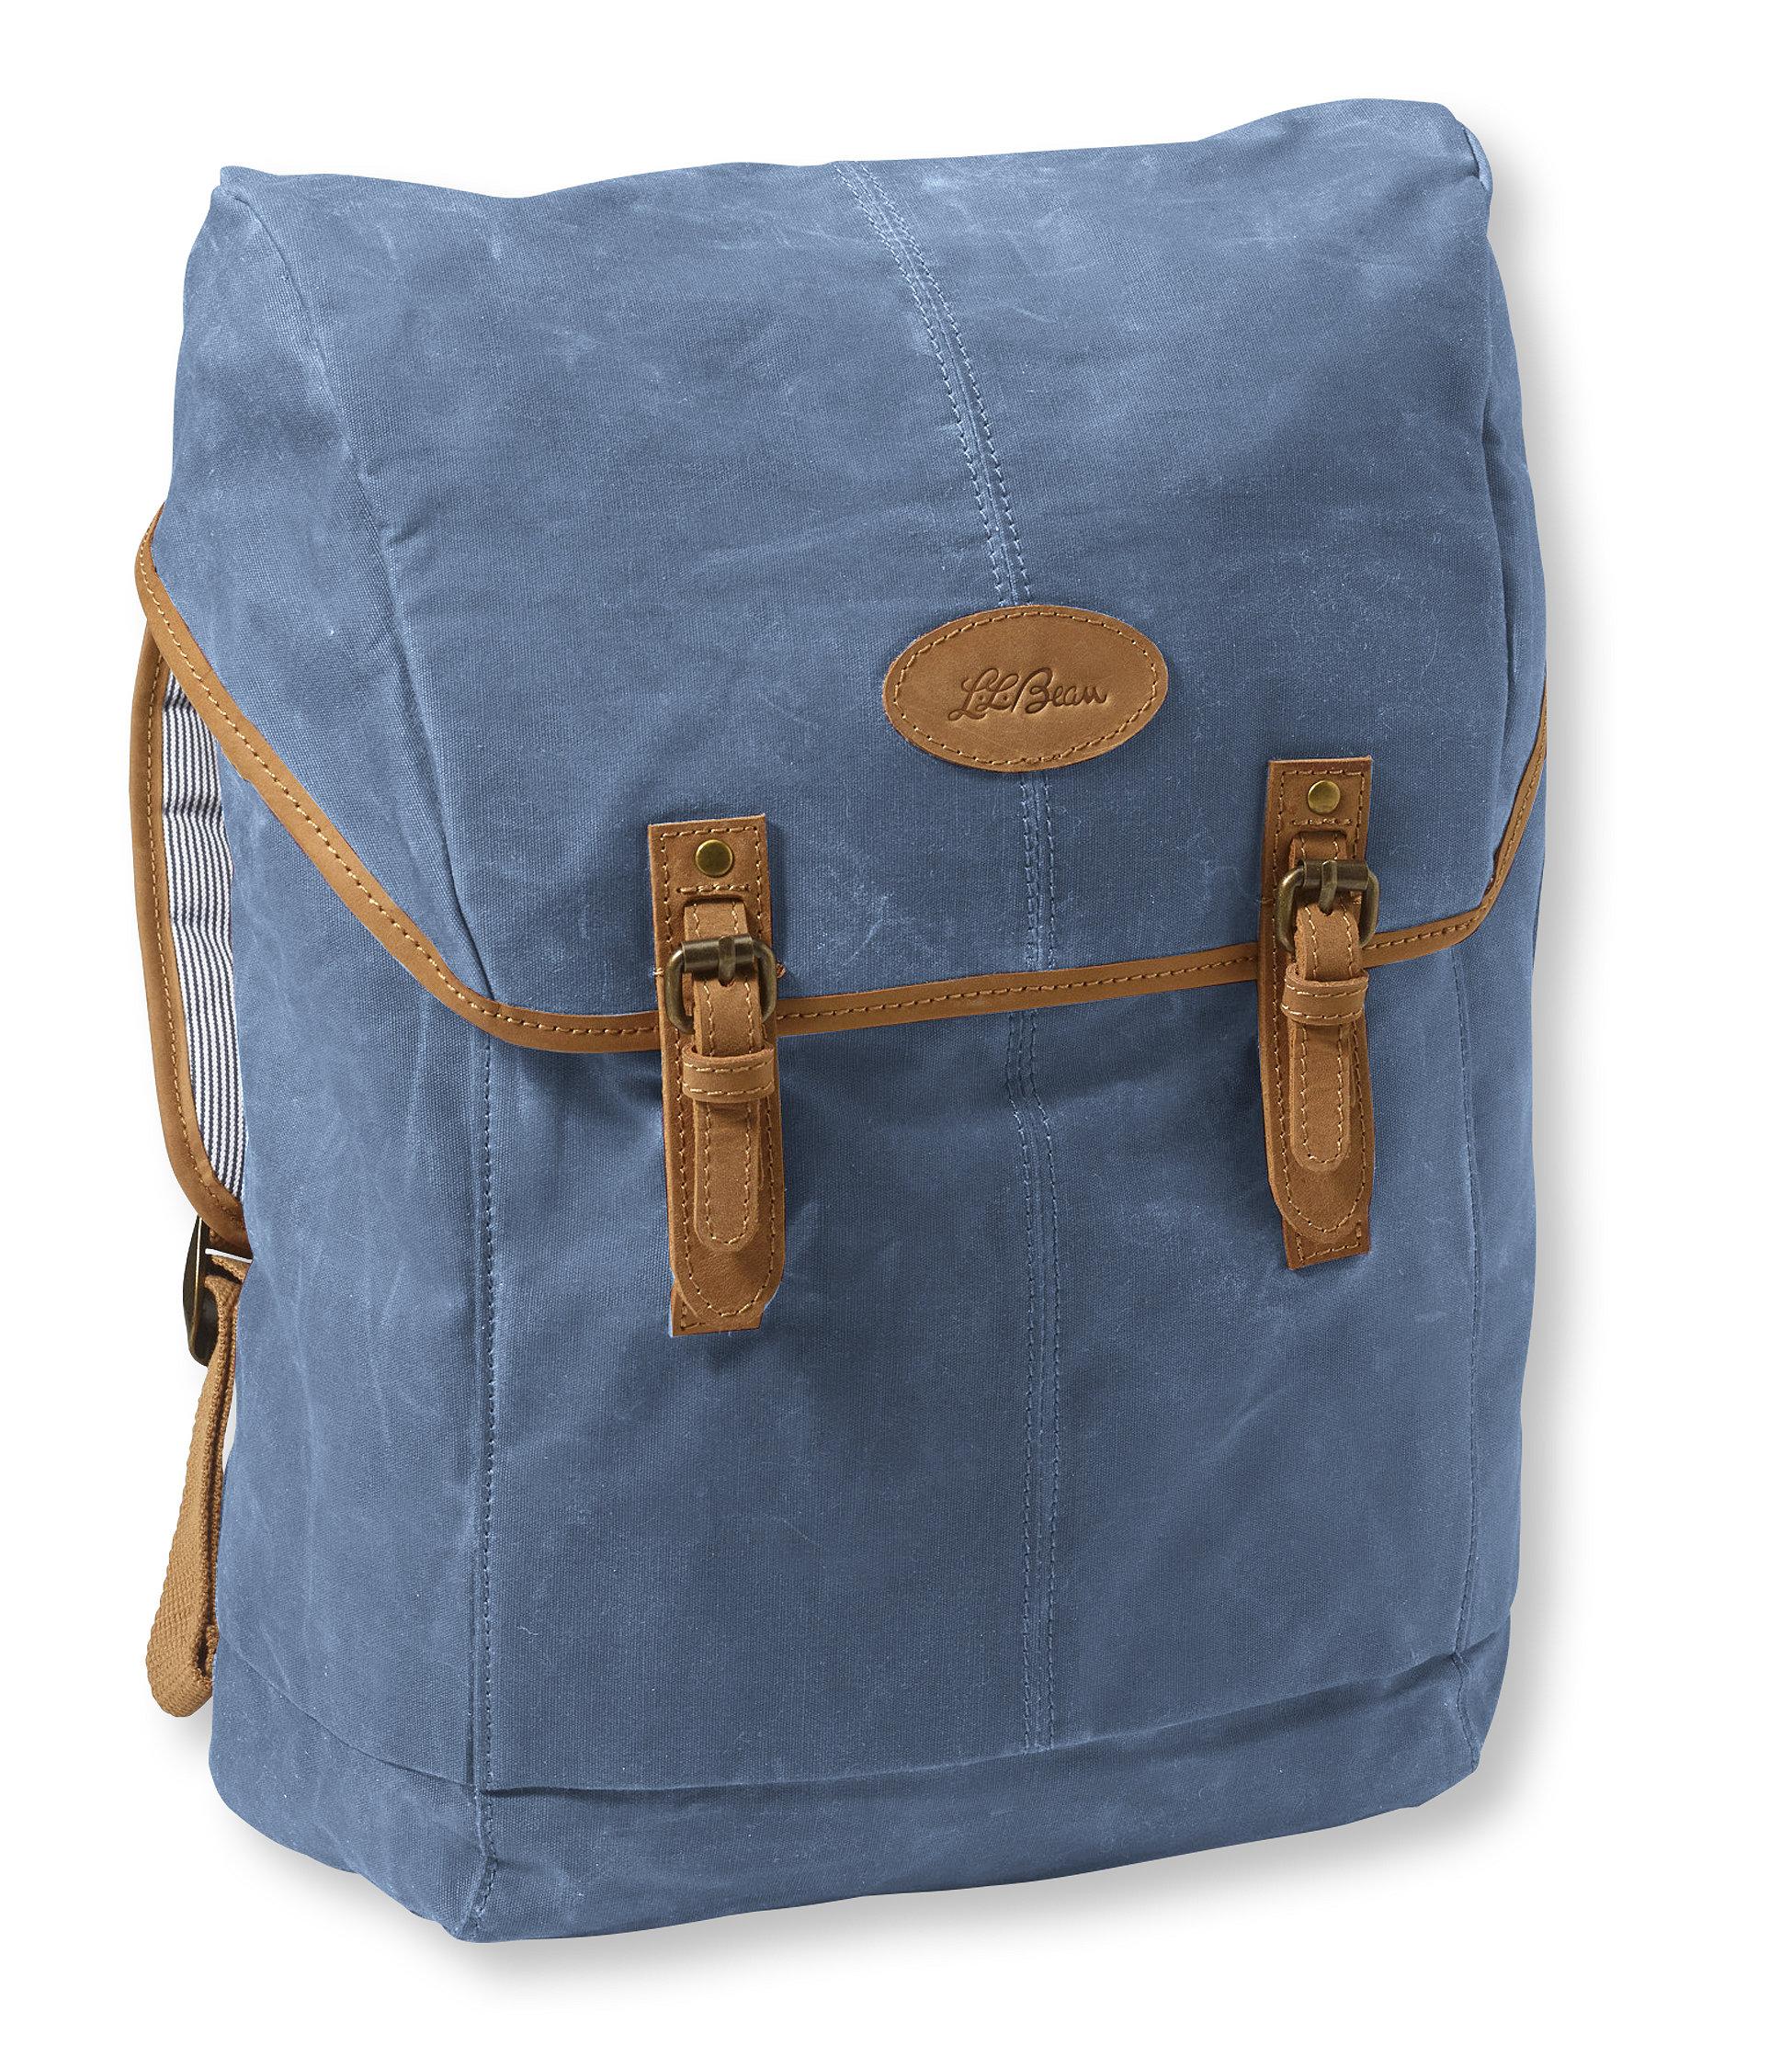 L.L.Bean Mountain Town Waxed Canvas Backpack